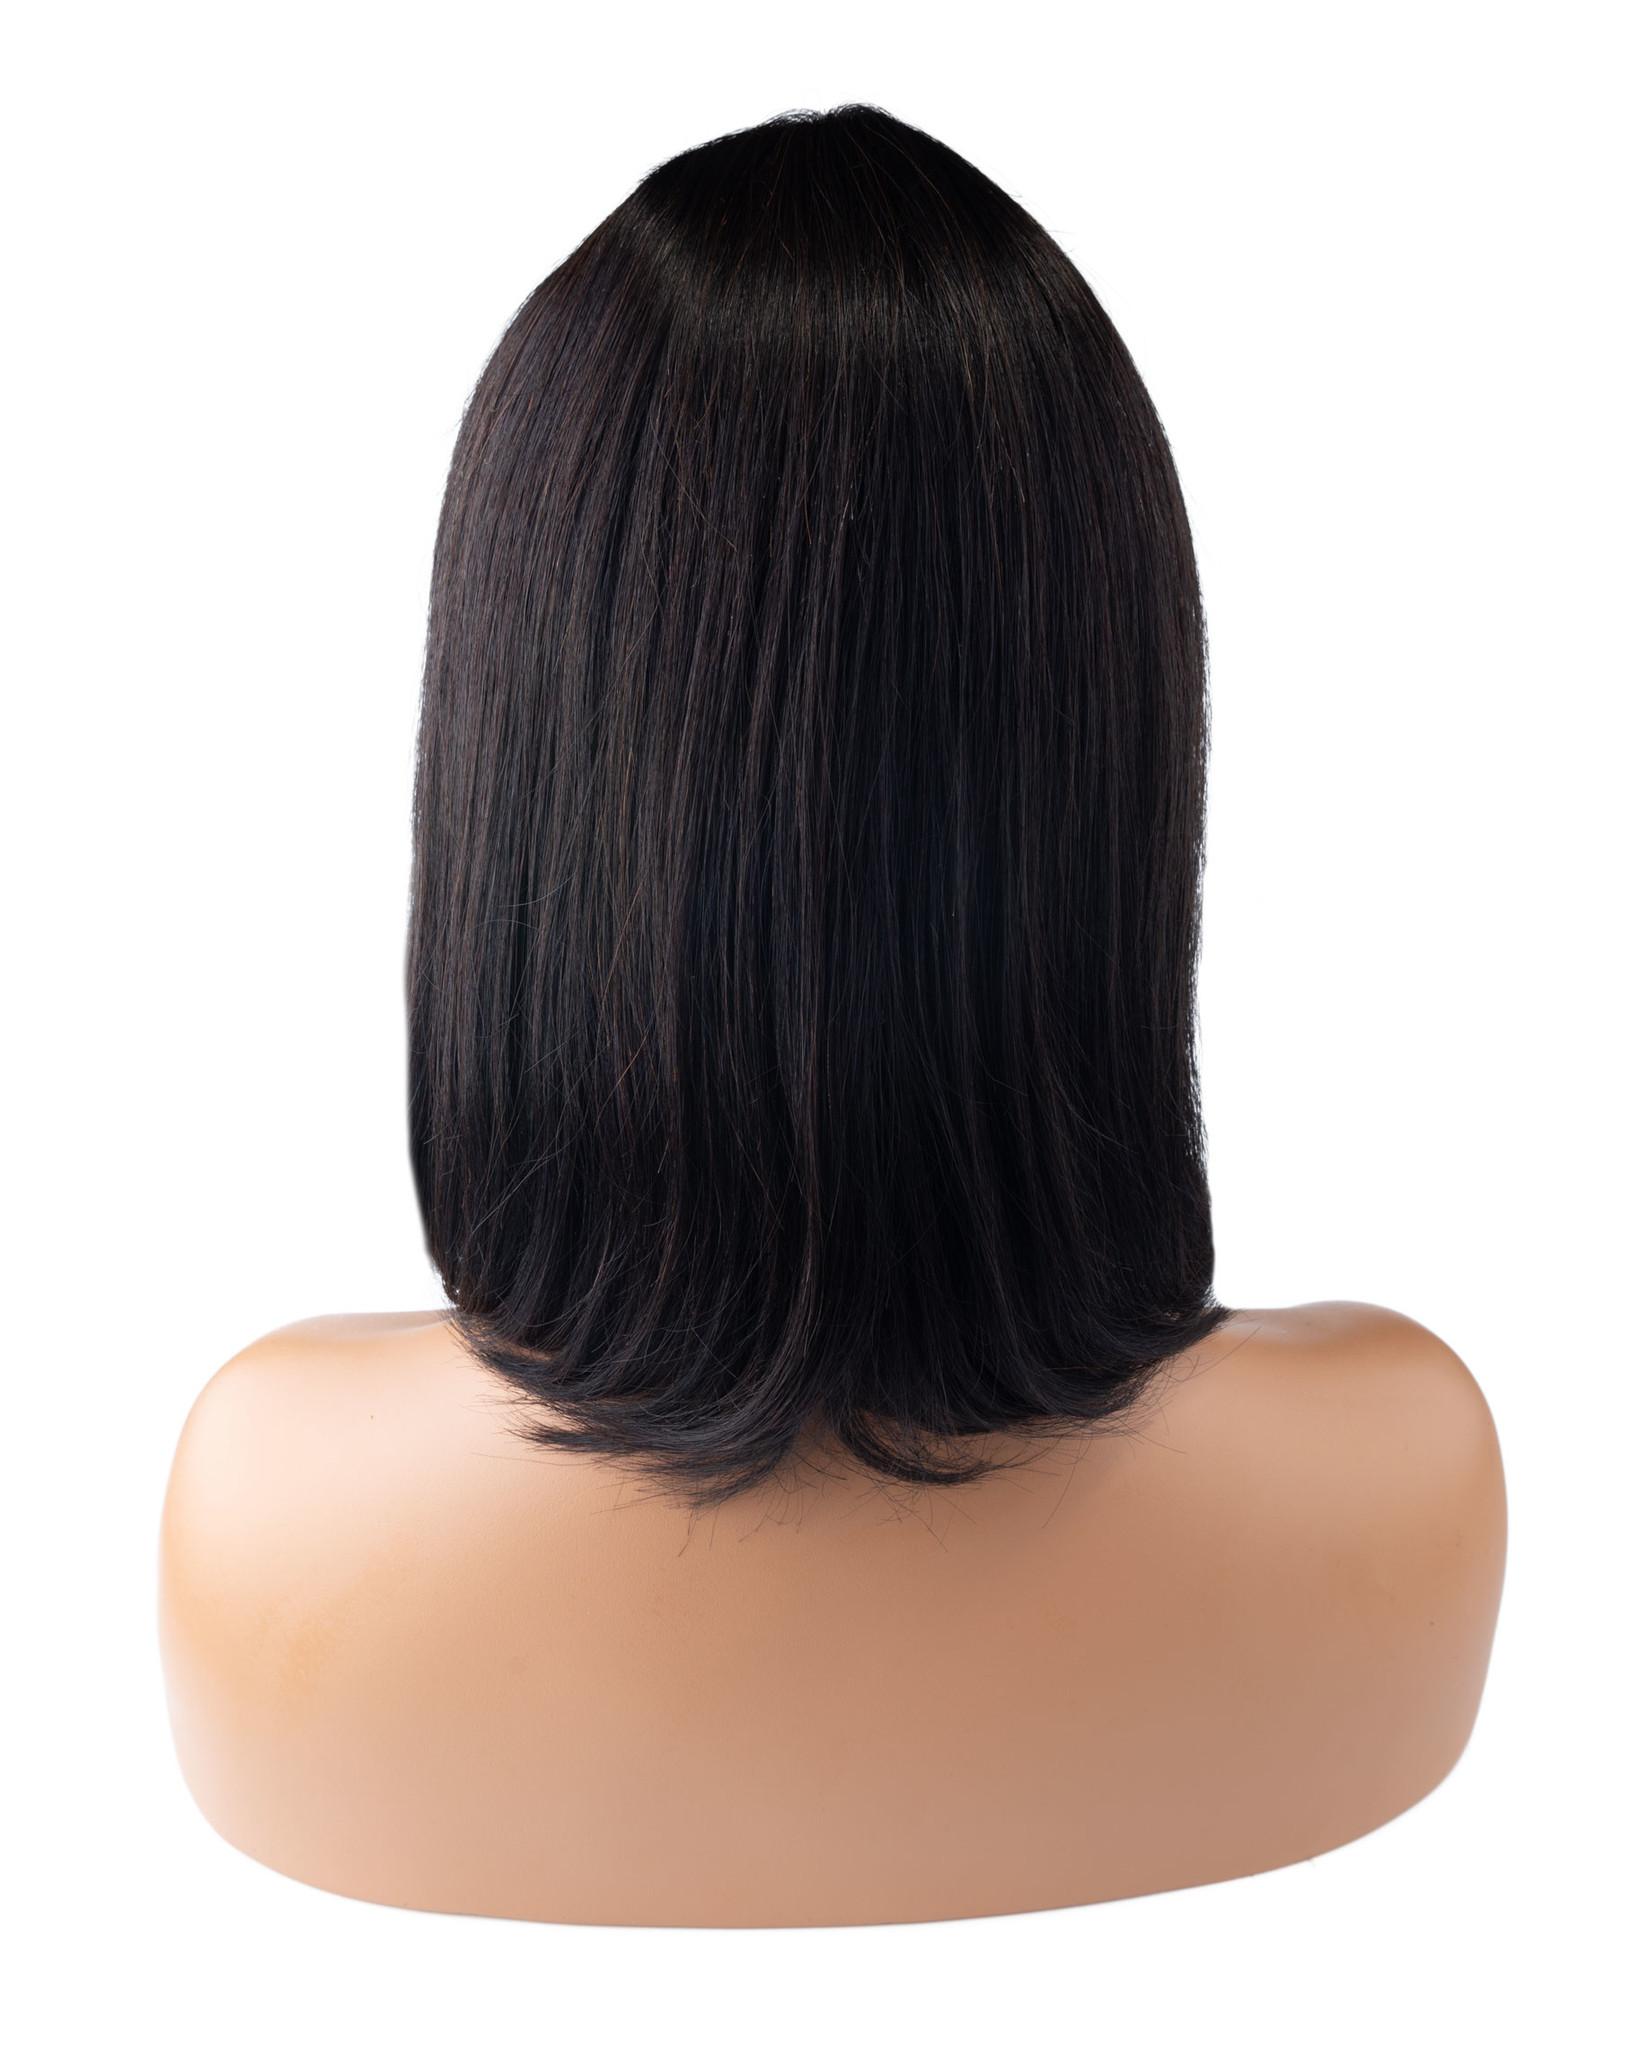 Shri SilverFox Indian Shri Front Lace Wig - BOB